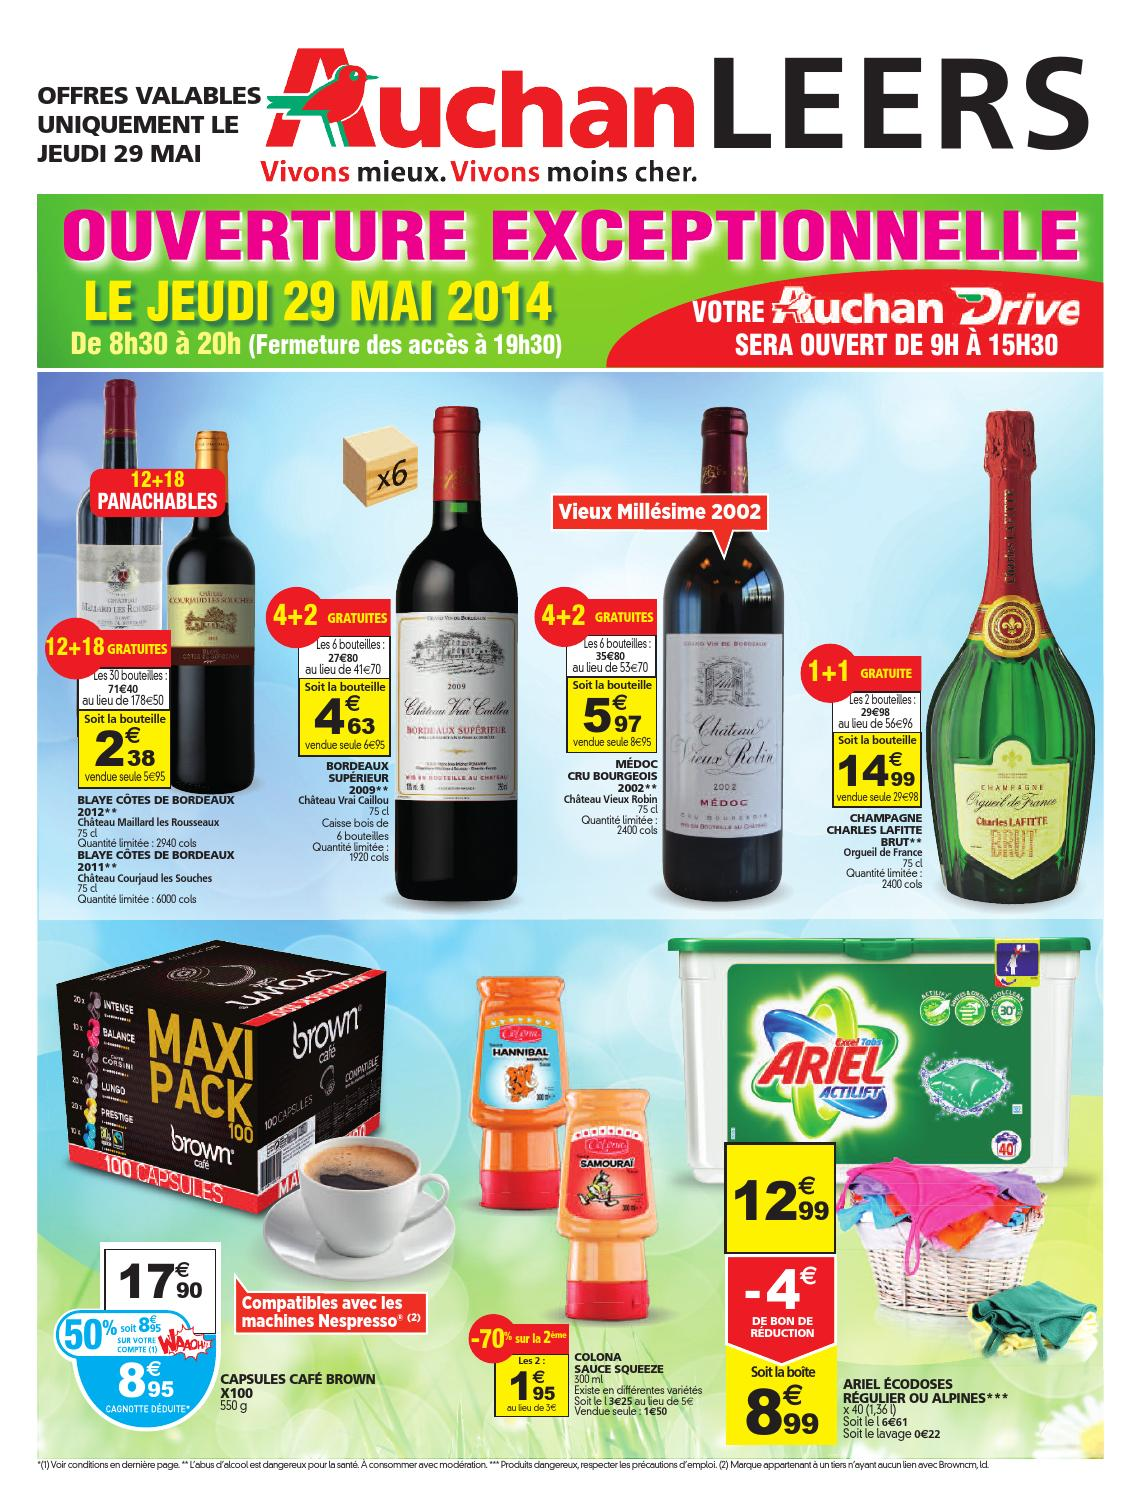 Catalogue auchan le 29 mai by anti issuu - Catalogue auchan leers ...